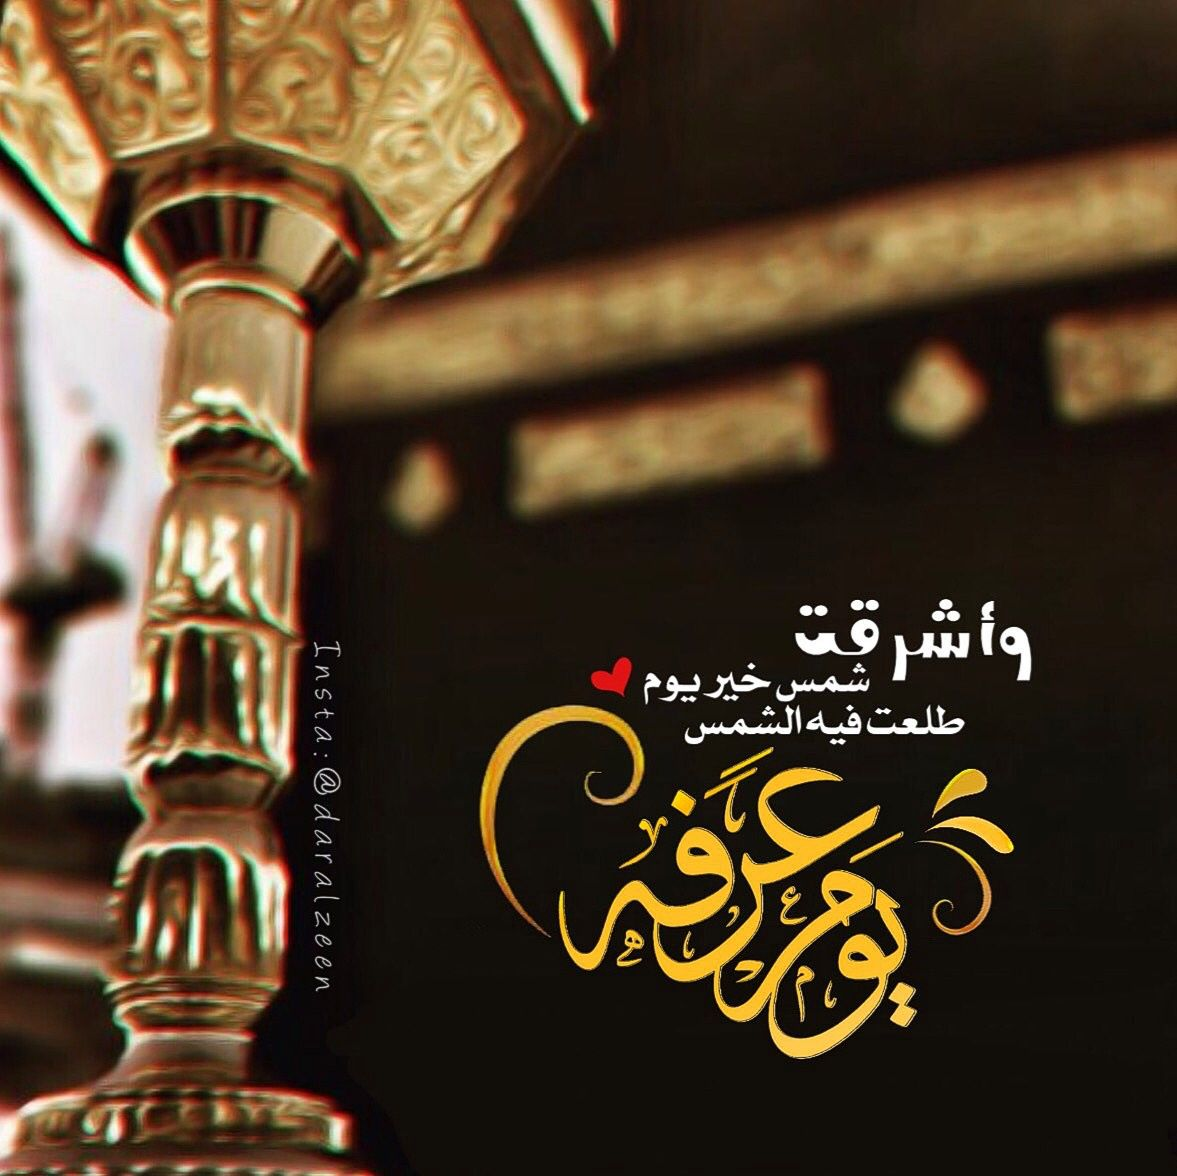 يوم عرفه Eid Images Mecca Islam Islamic Pictures